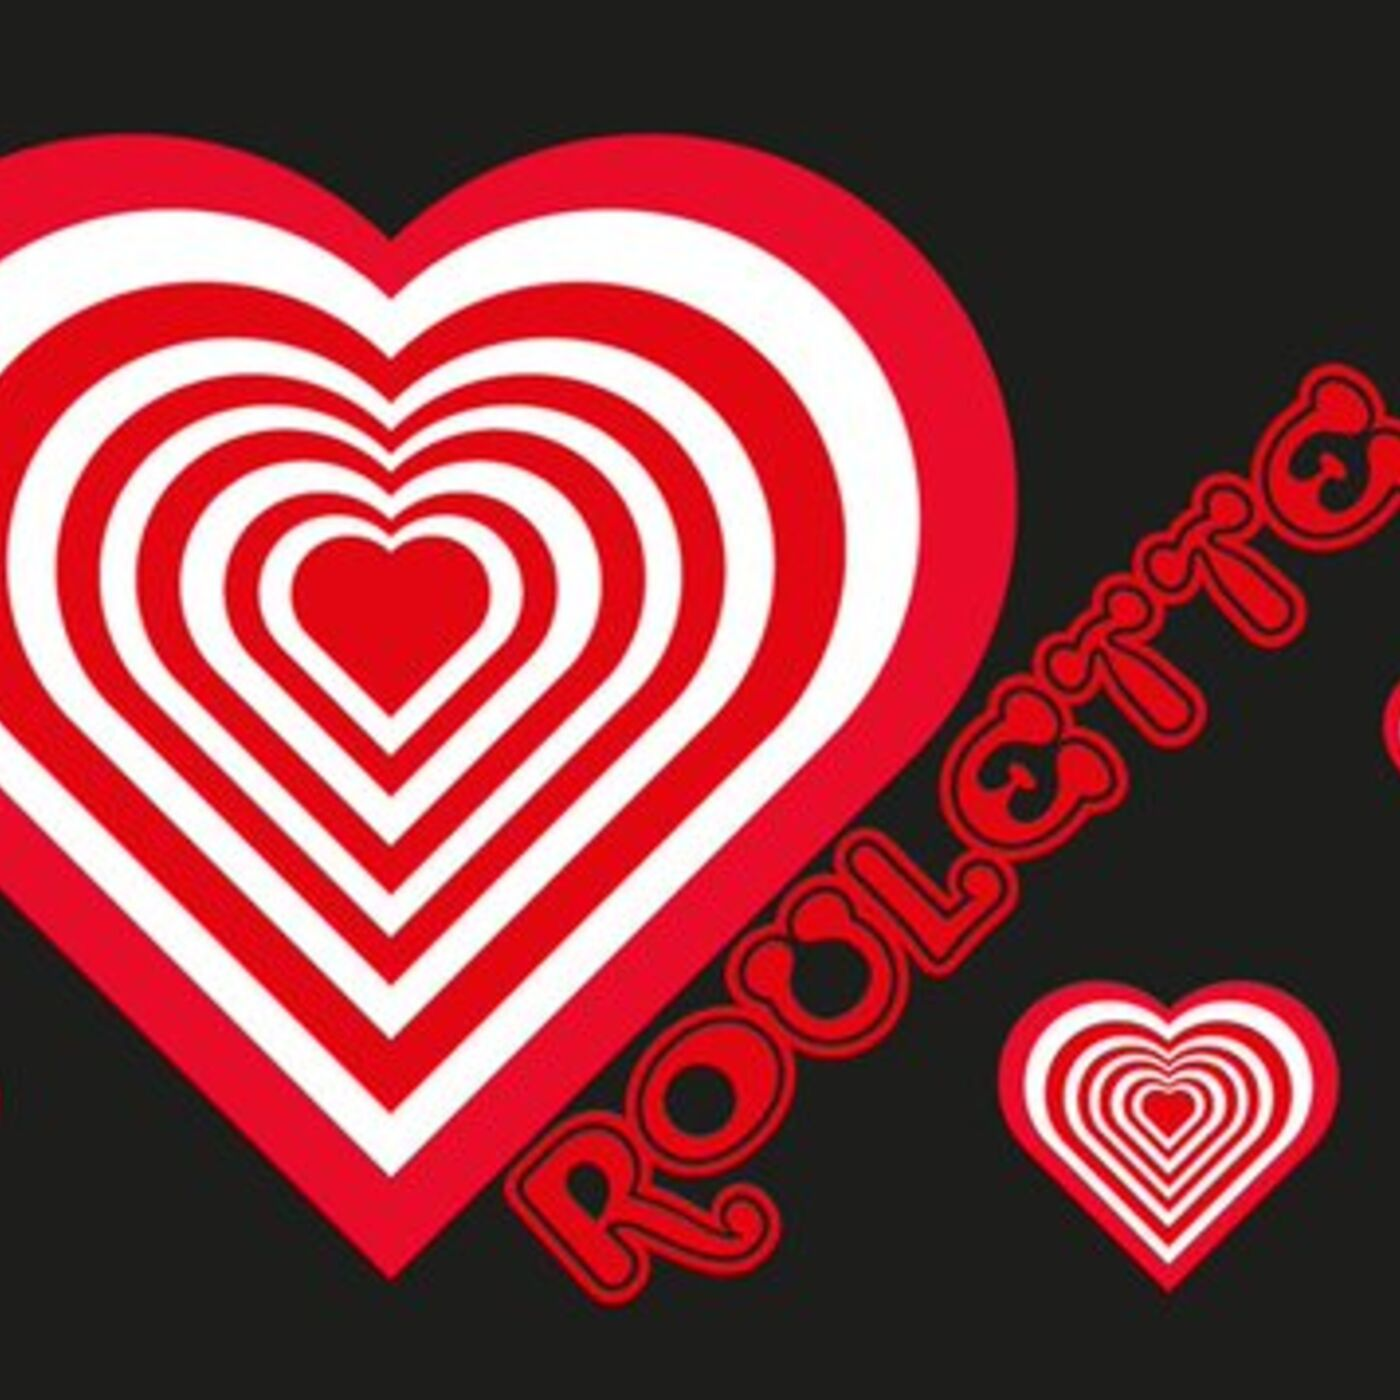 198 Love Roulette